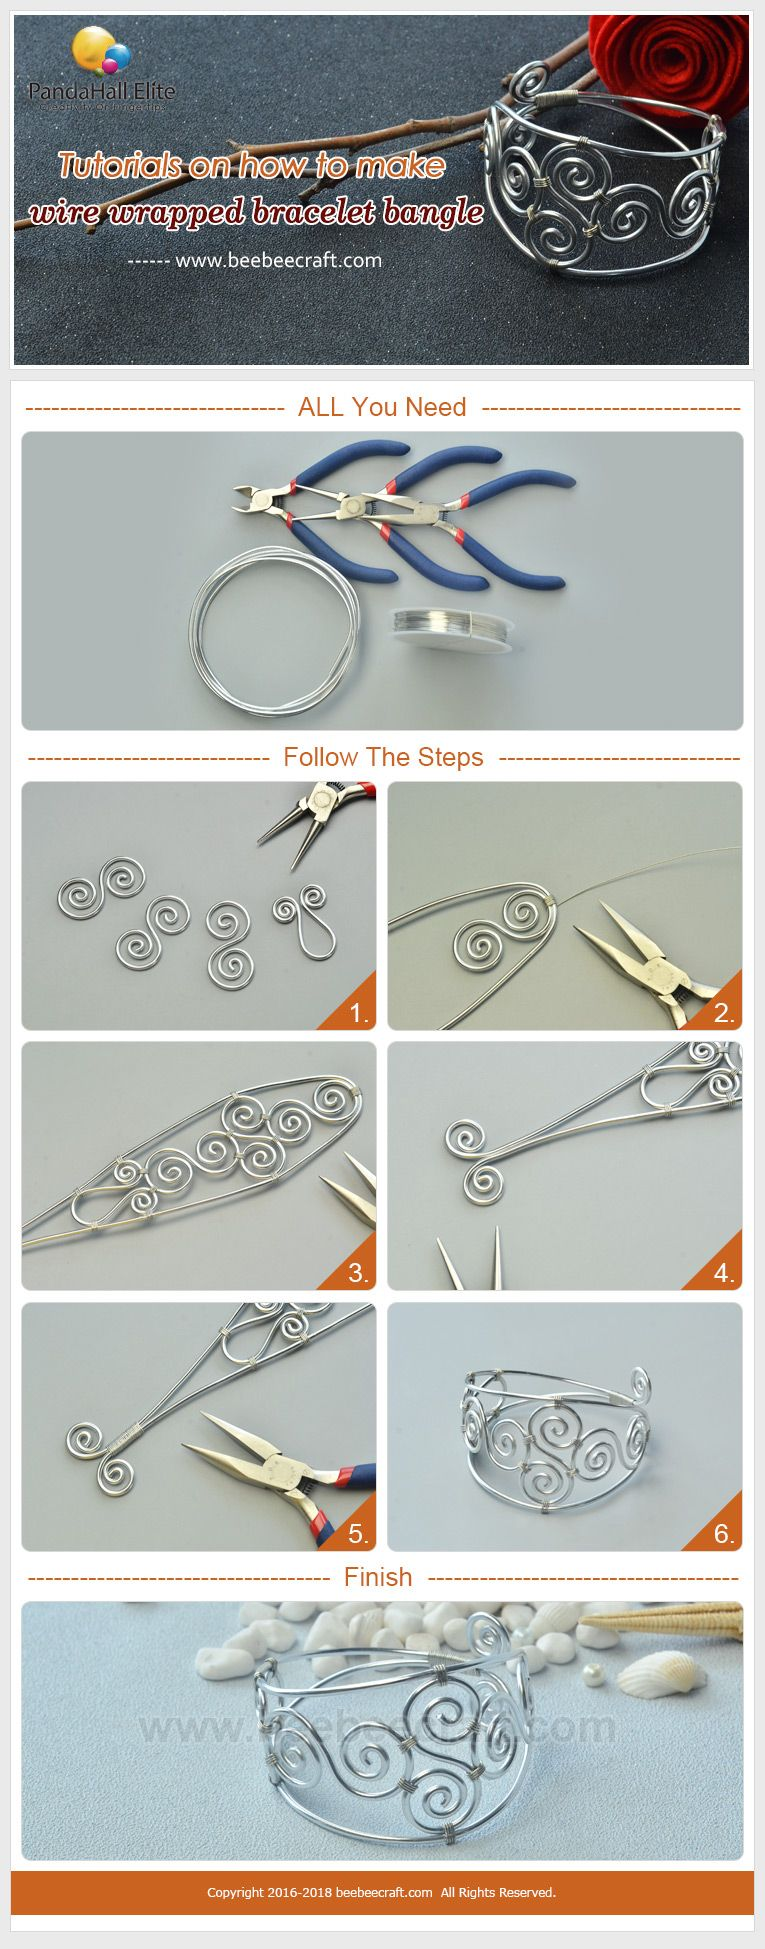 Beebeecraft #Tutorials on how to make #wirewrapped #bracelet #bangle ...